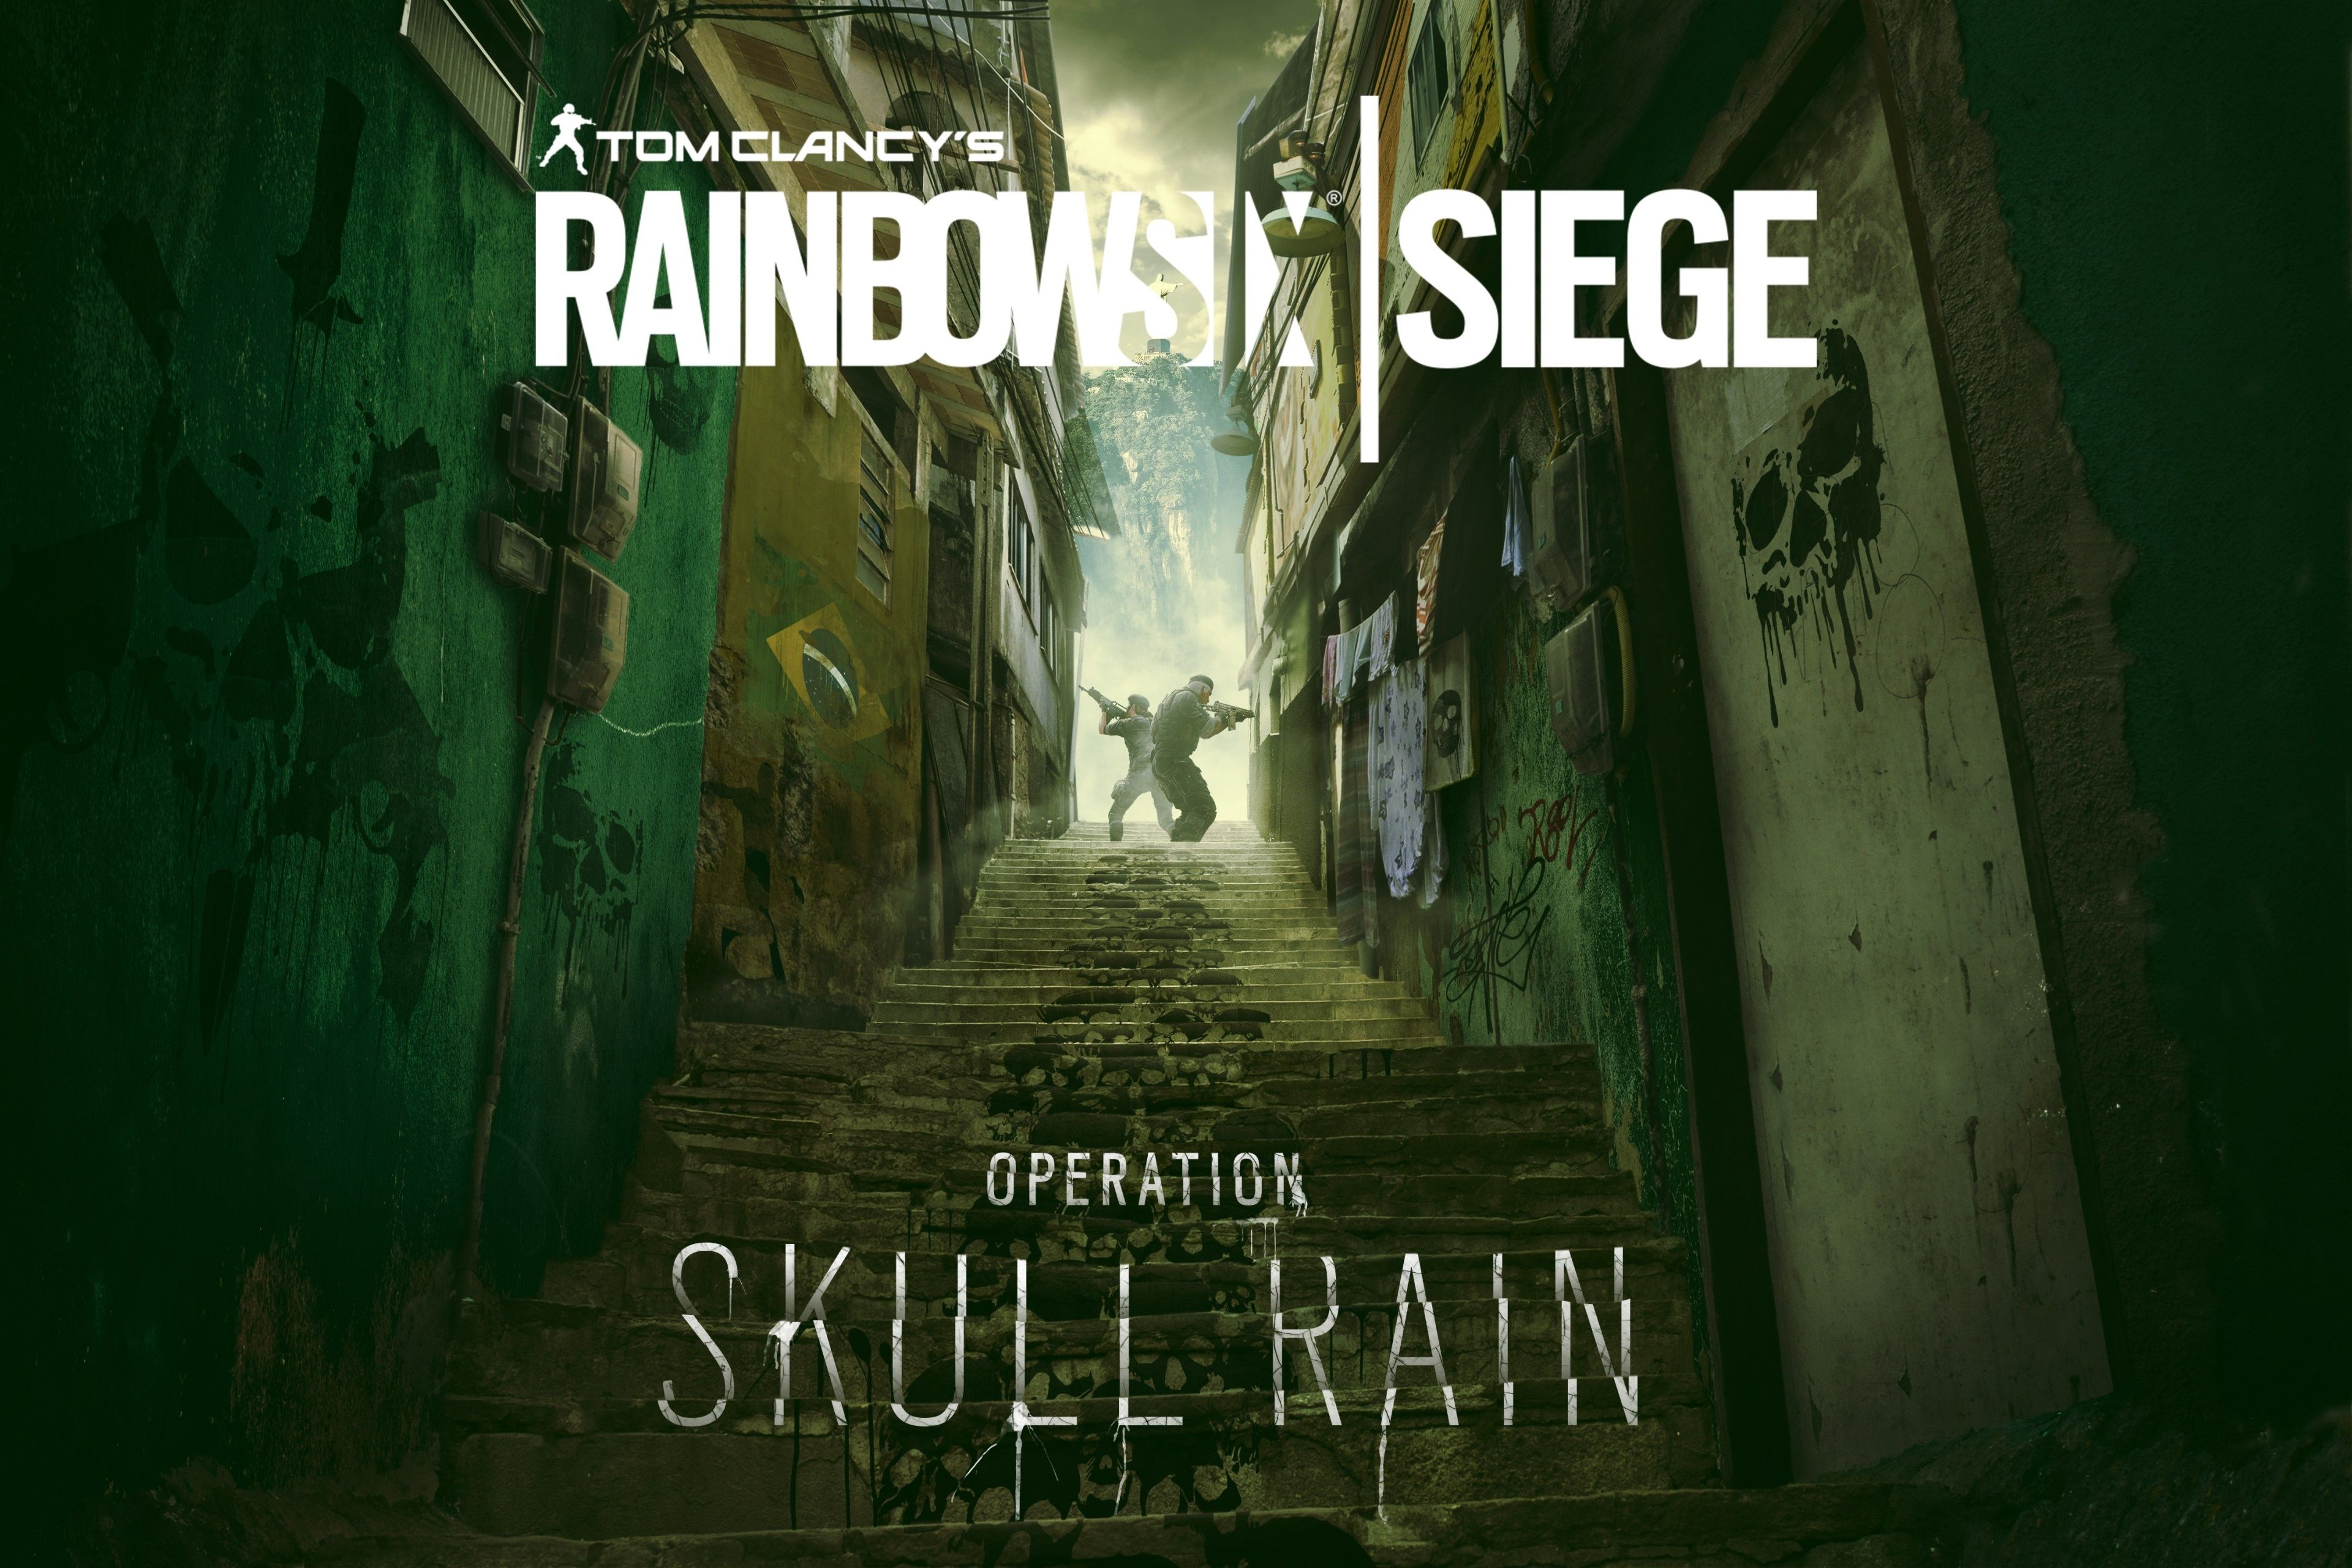 3840x2560 Operation Skull Rain 4k Hd Wallpaper Widescreen Rainbow Hd Wallpaper Tom Clancy S Rainbow Six